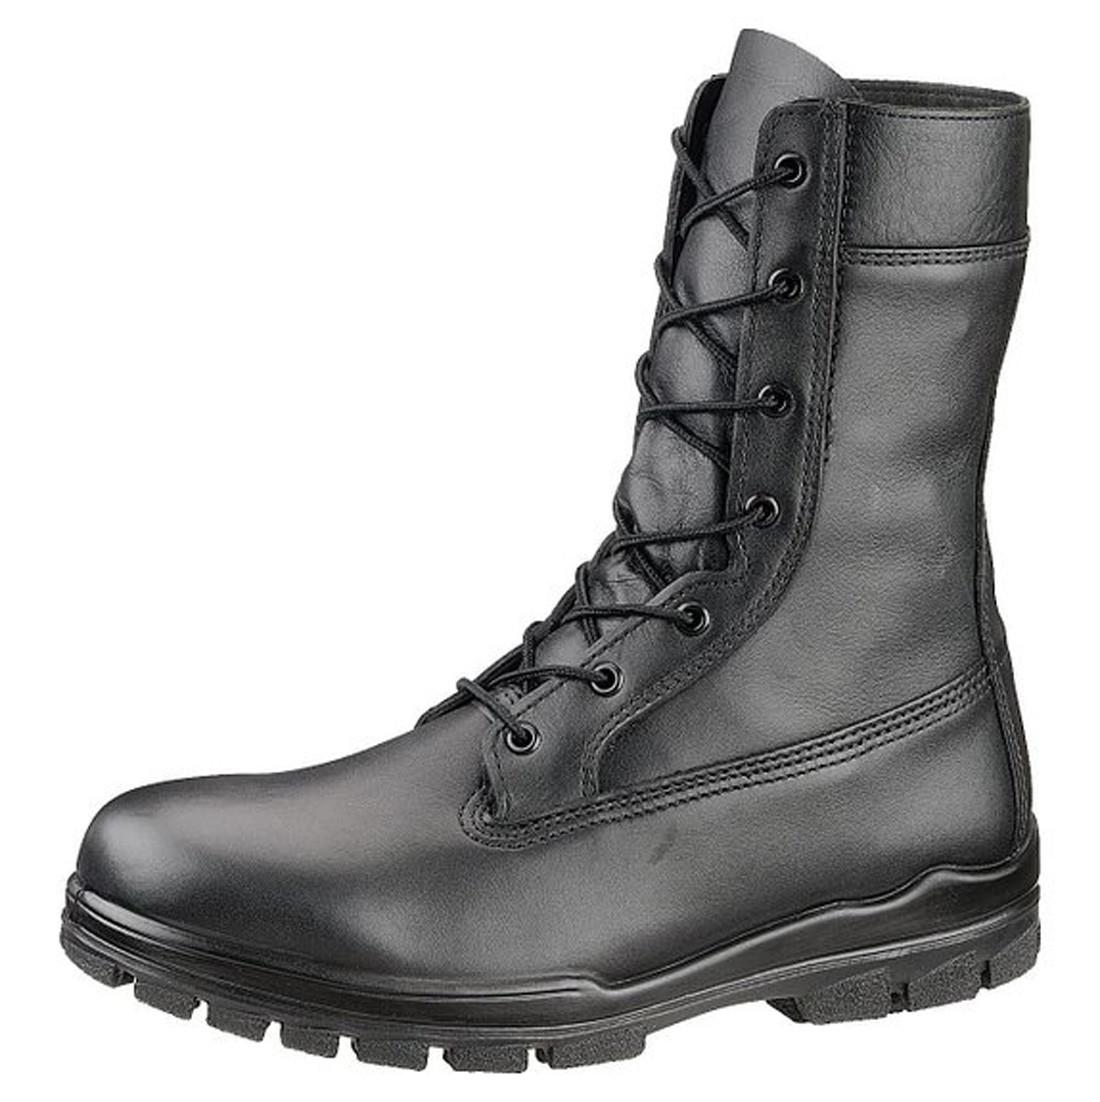 4cbba94b51b Bates 1788-B Womens Steel Toe 9 Inch US Navy Military Boot